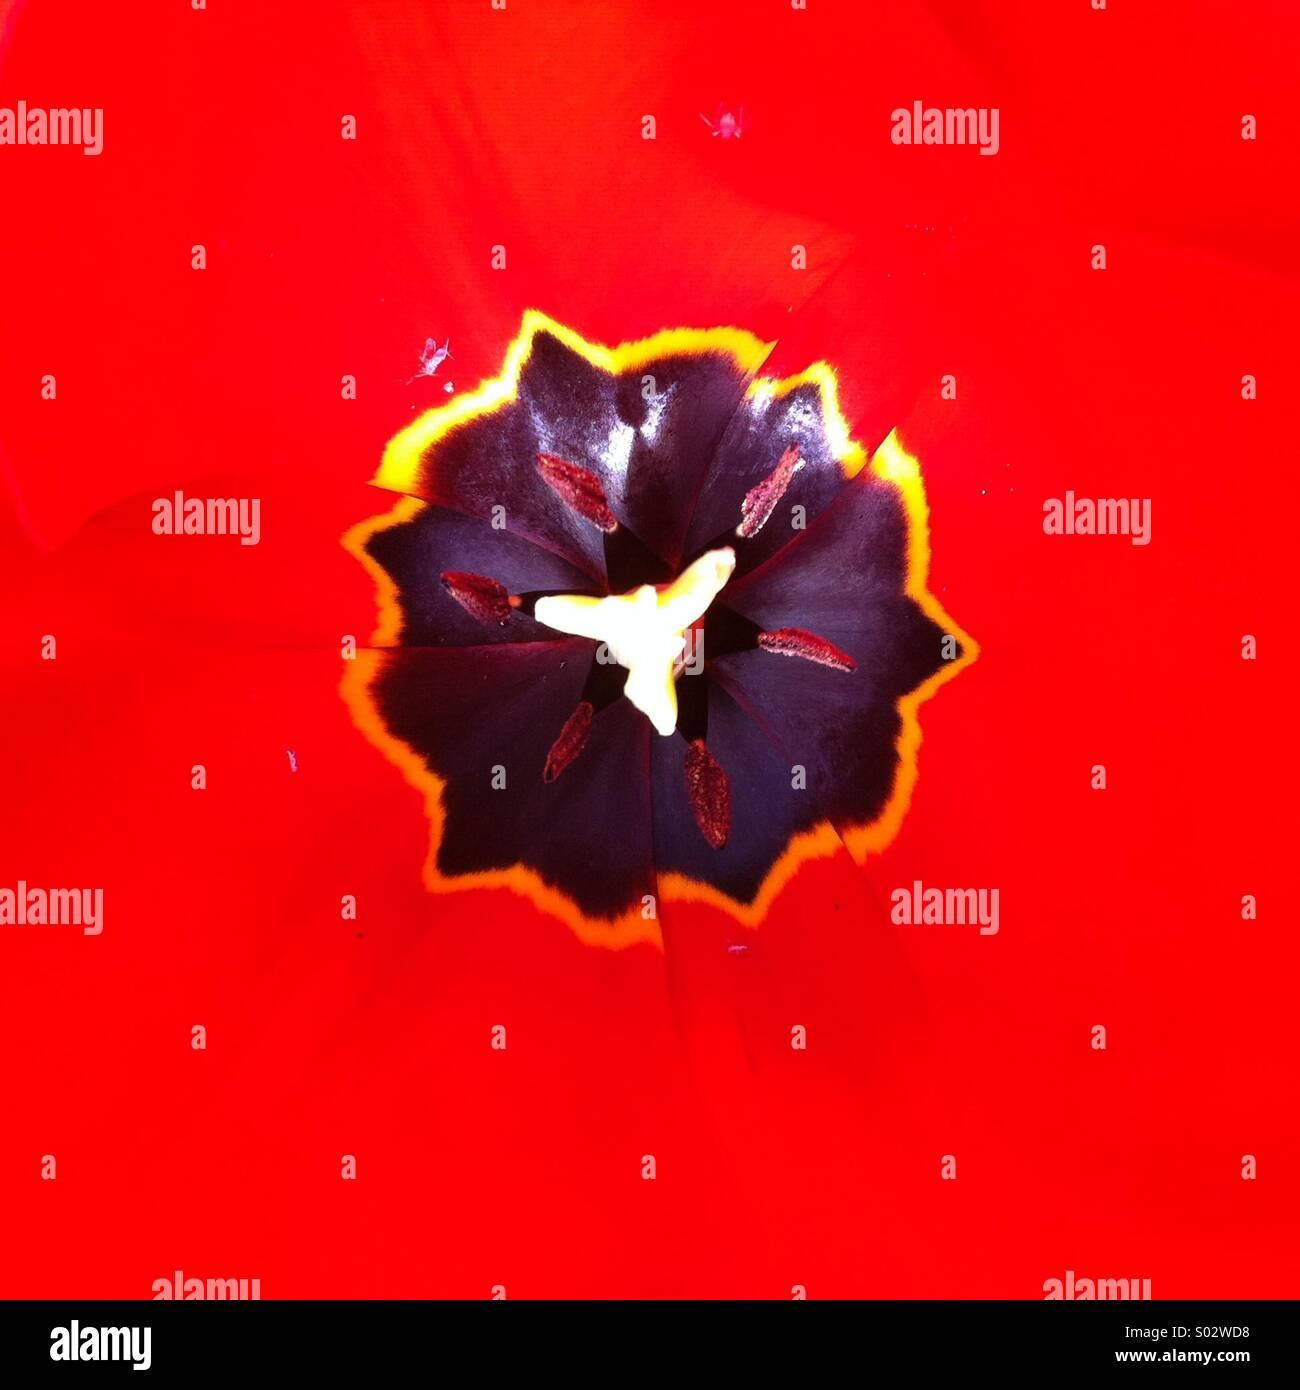 Negro de forma desigual sobre fondo rojo fuerte Tulip flower cerrar Imagen De Stock